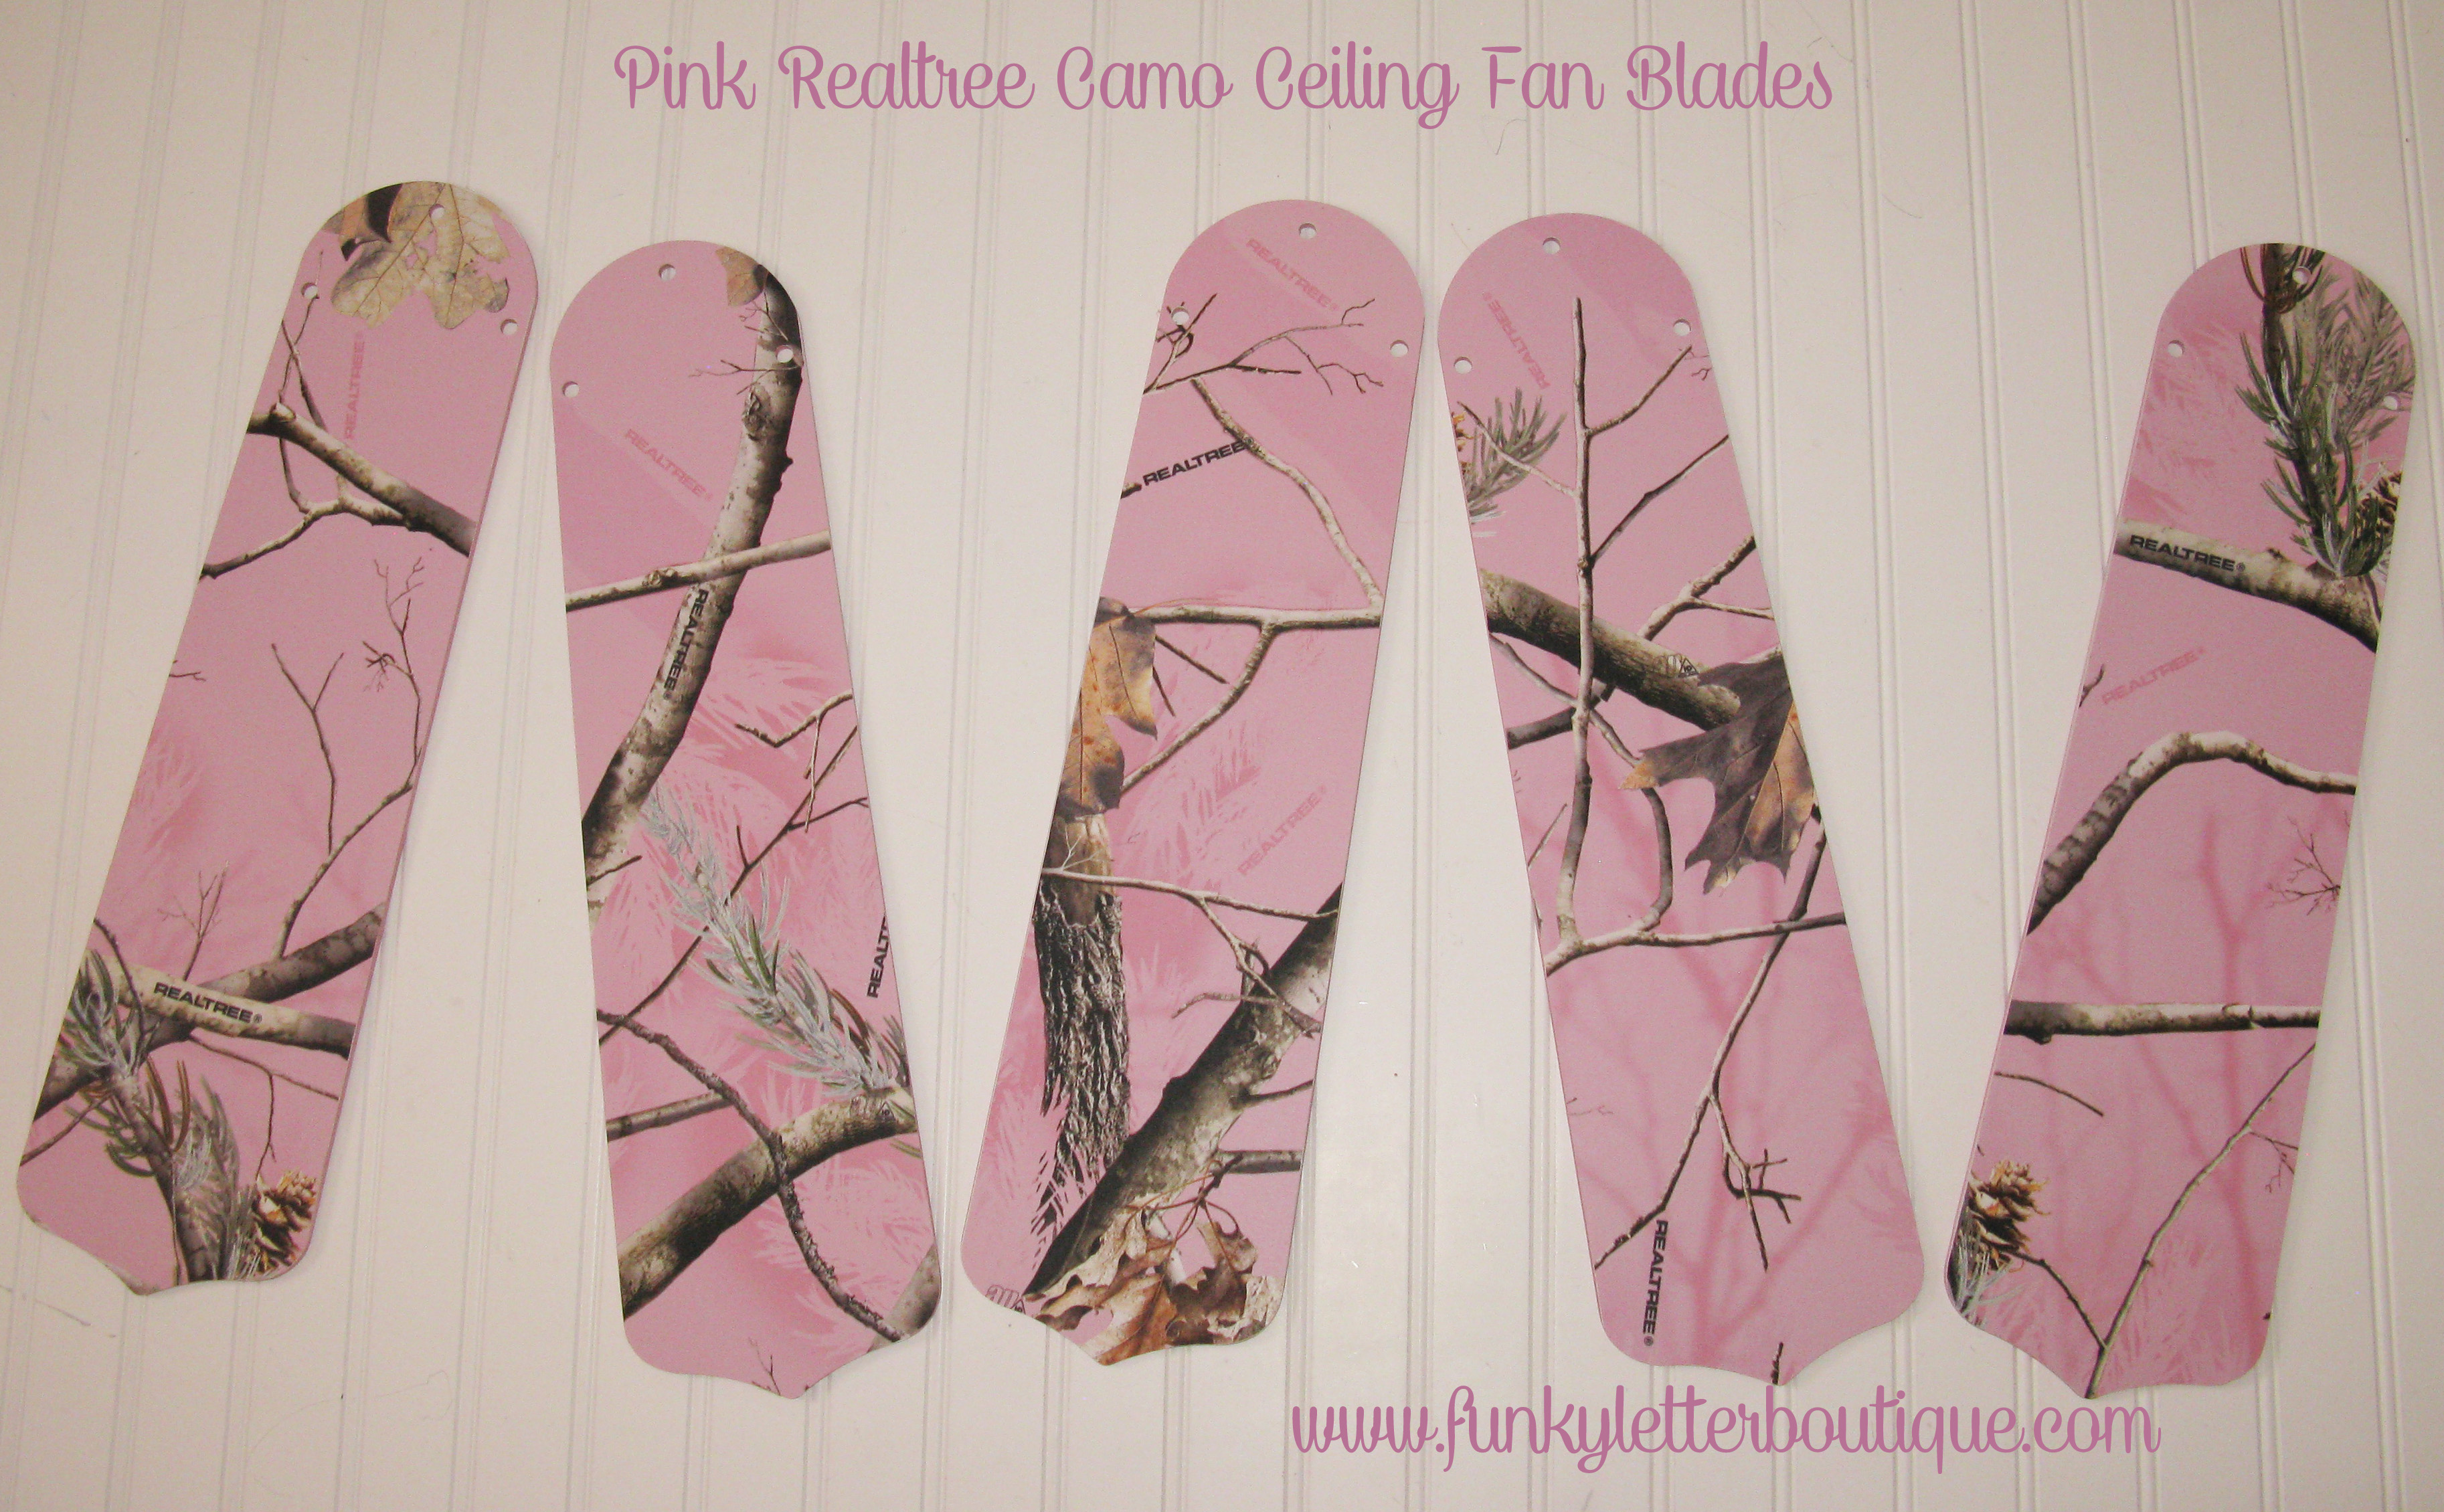 Pink realtree ap camo ceiling fan blades funky letter boutique pink realtree ap camo ceiling fan blades aloadofball Gallery